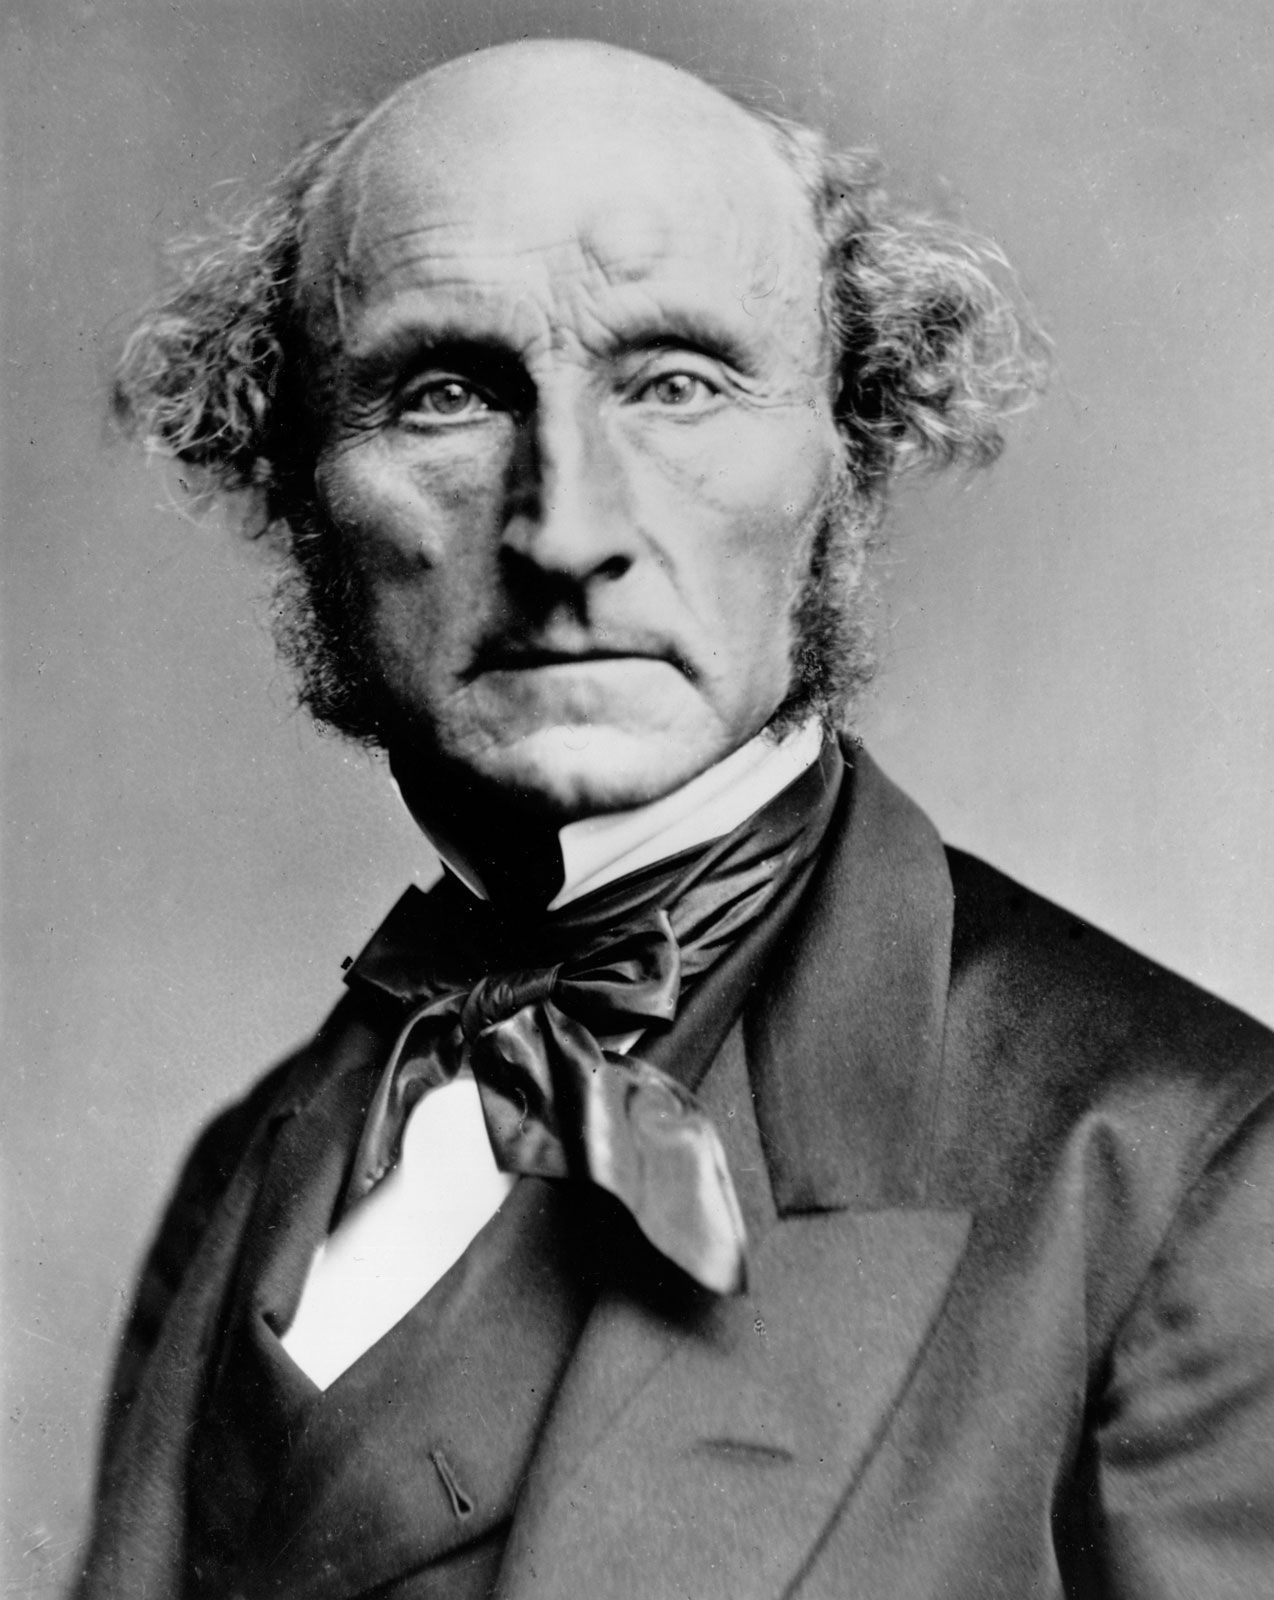 ¿Qué planteaba John Stuart Mill?